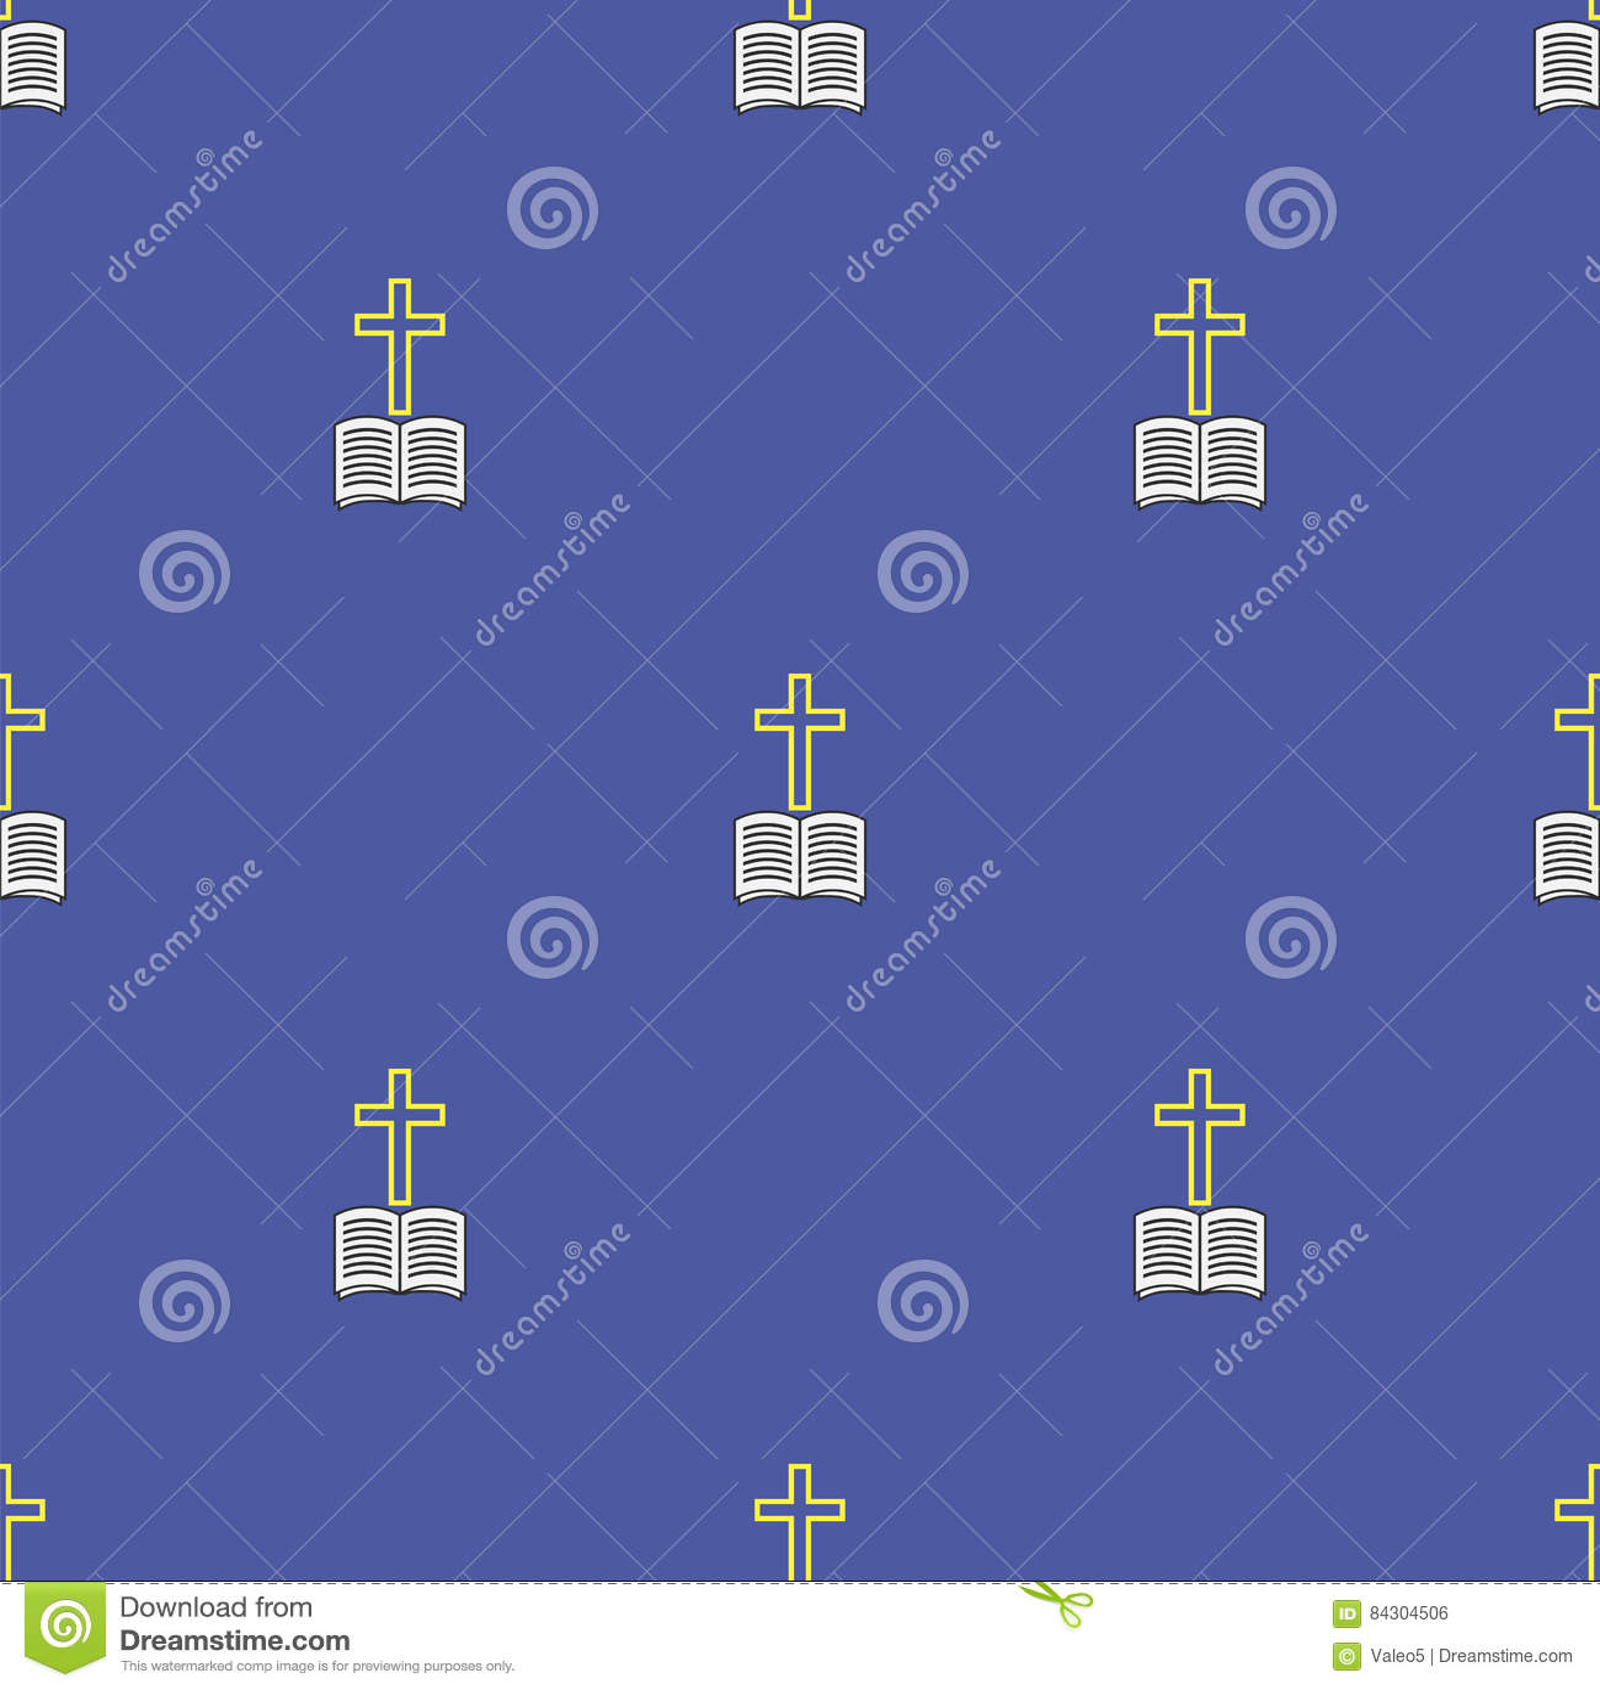 Religion Icons Seamless Pattern